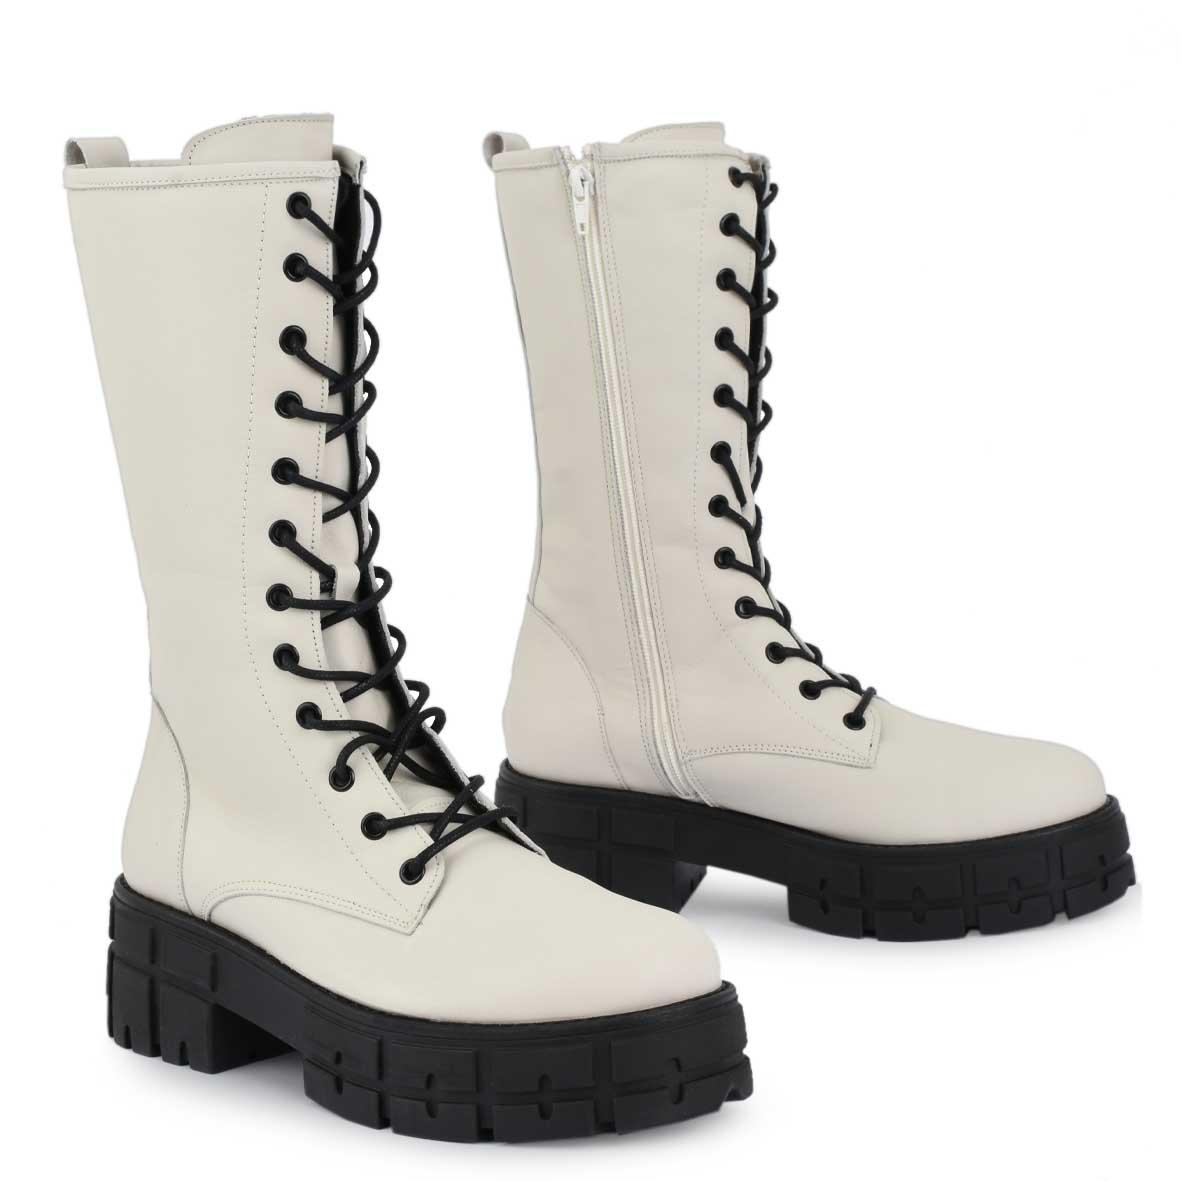 COMBAT BOOTS σχέδιο: L21006703